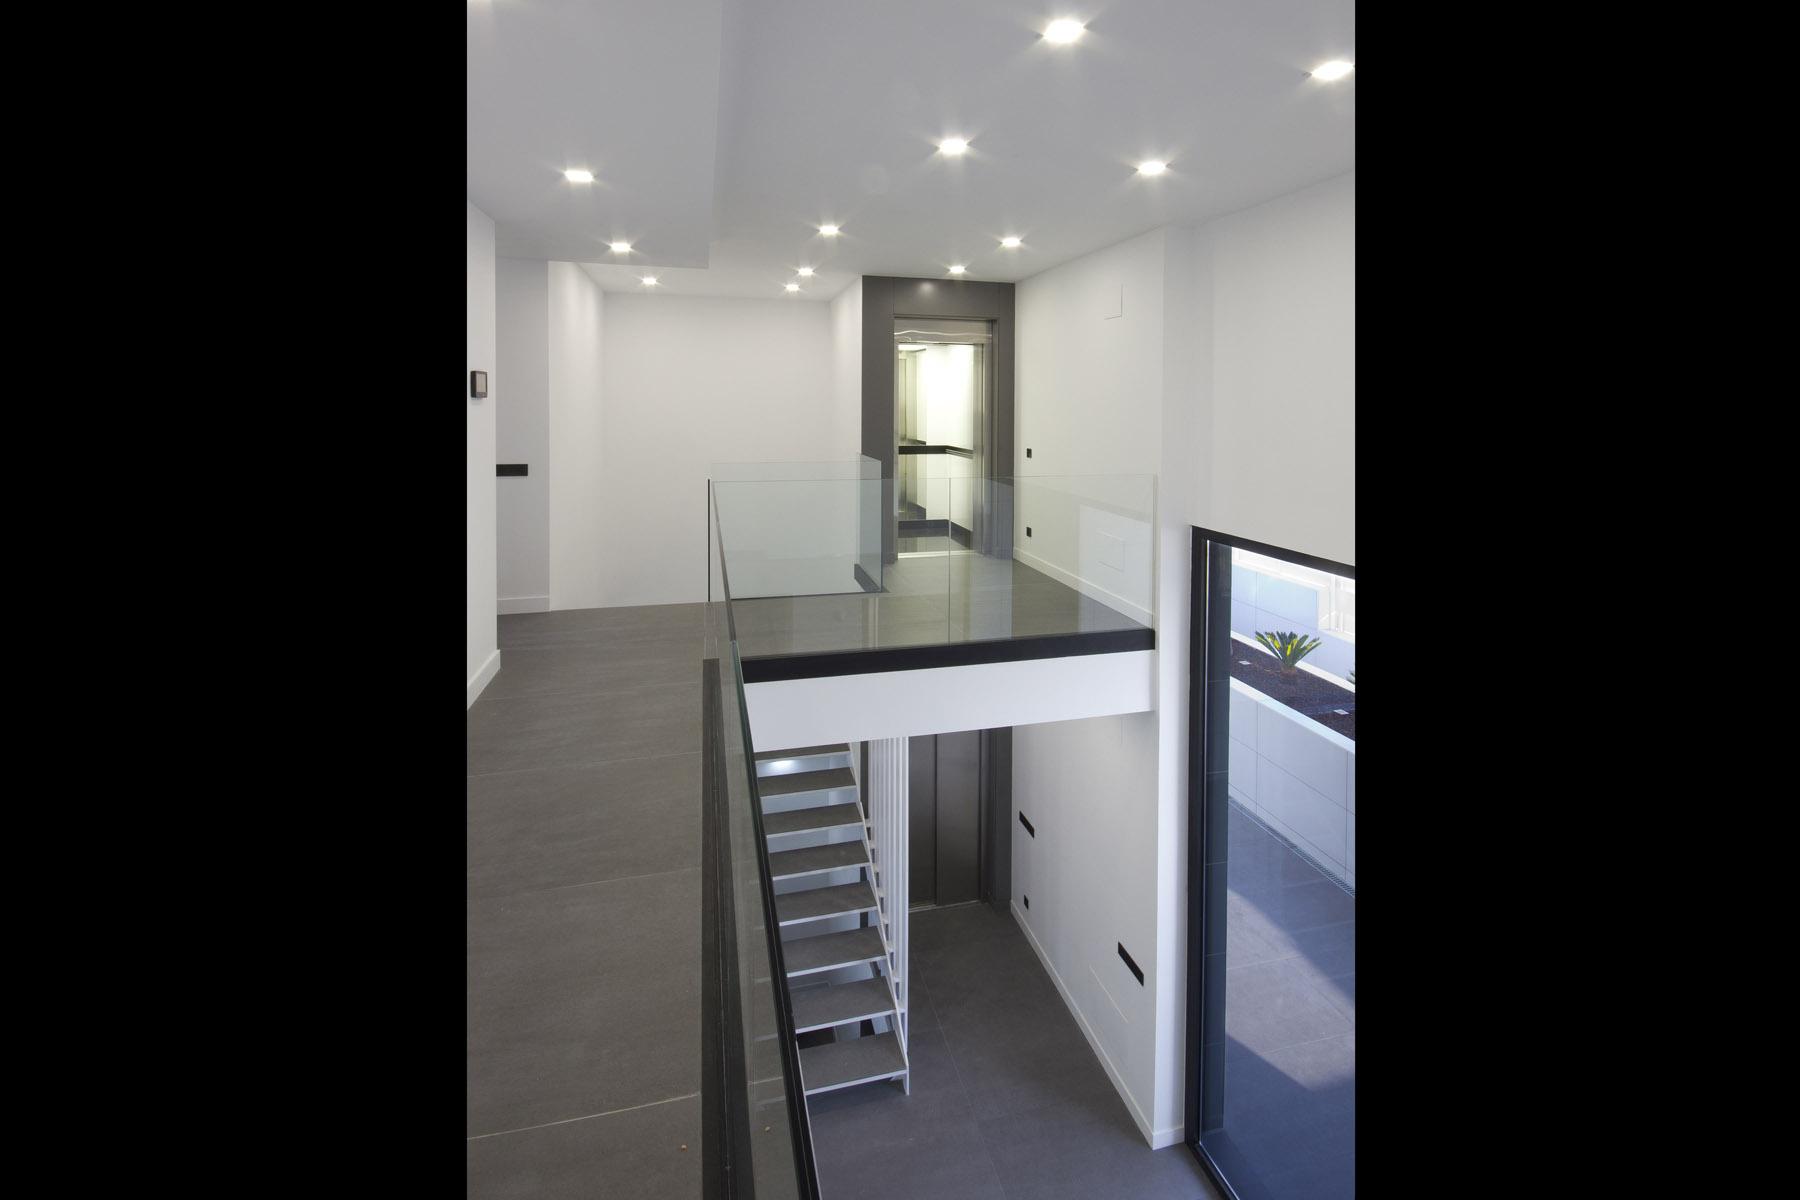 Vivienda-unifamiliar-aislada-en-la-plana-de-sitges-barcelona-18